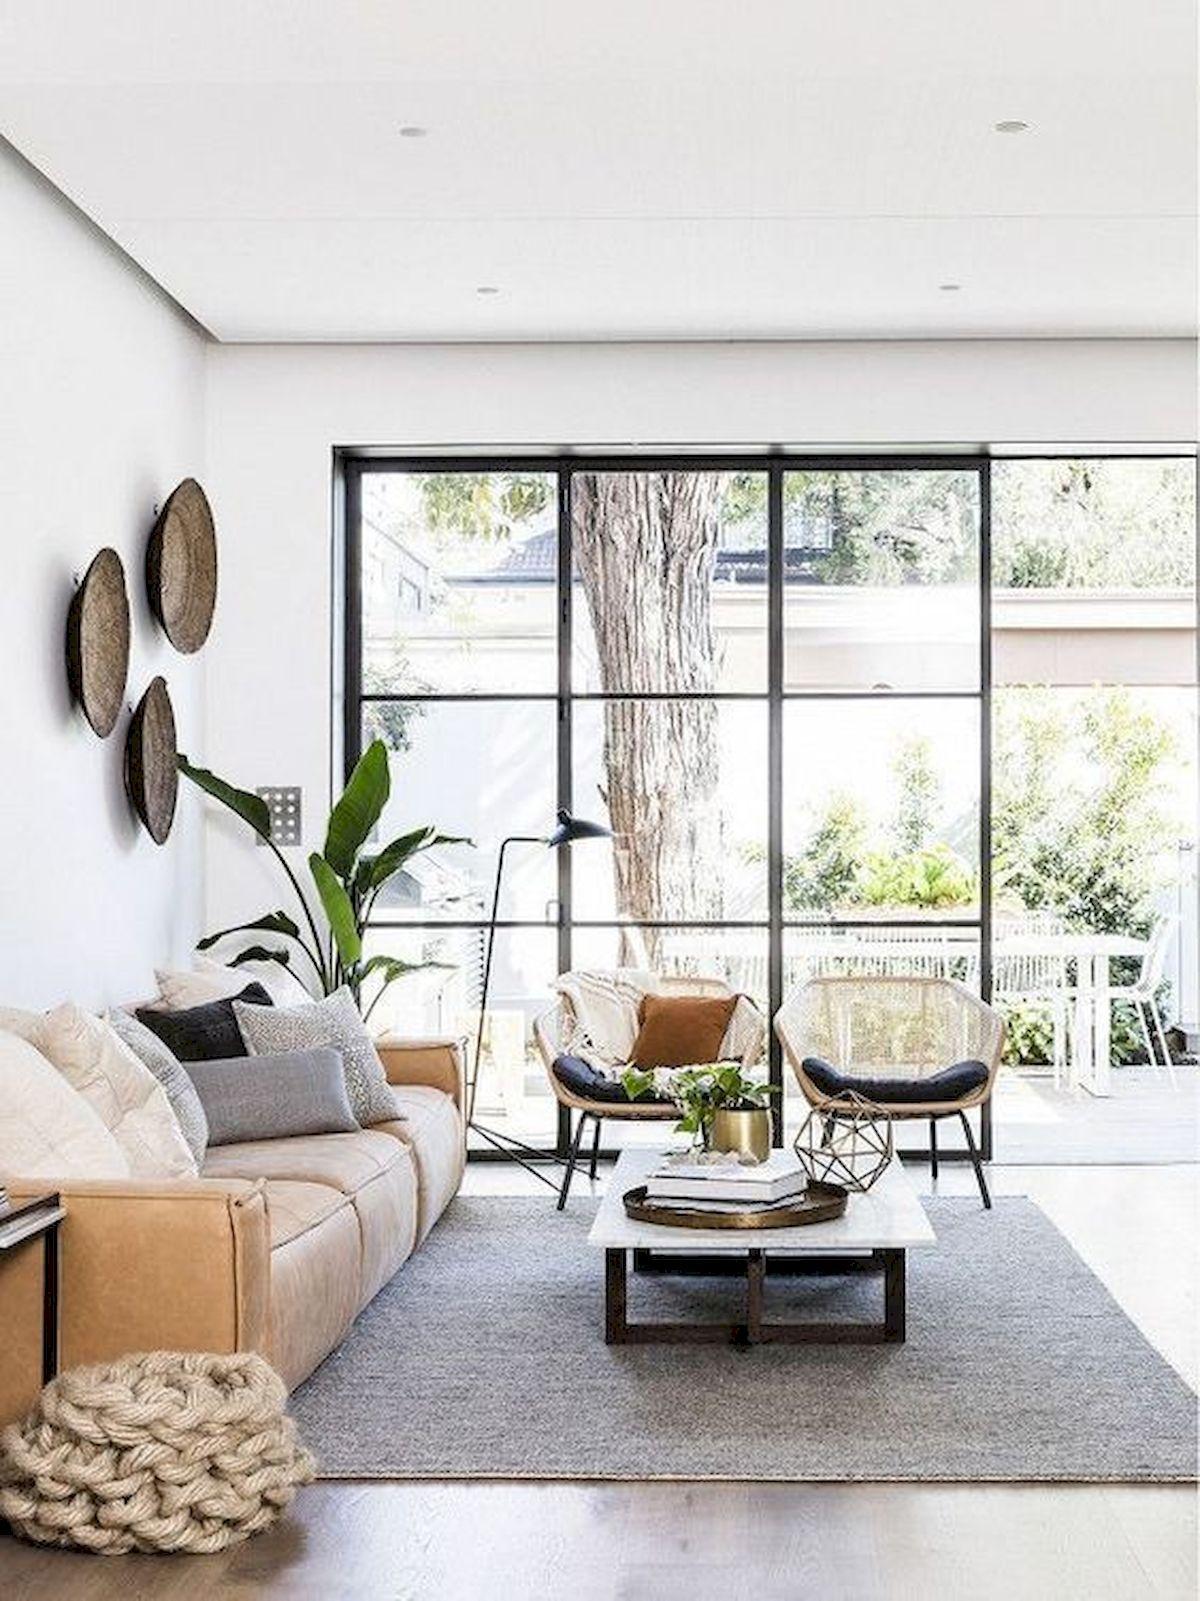 99 Creative Living Room Design Ideas You Ll Want To Steal Living Room Seating Living Room Scandinavian Minimalist Living Room